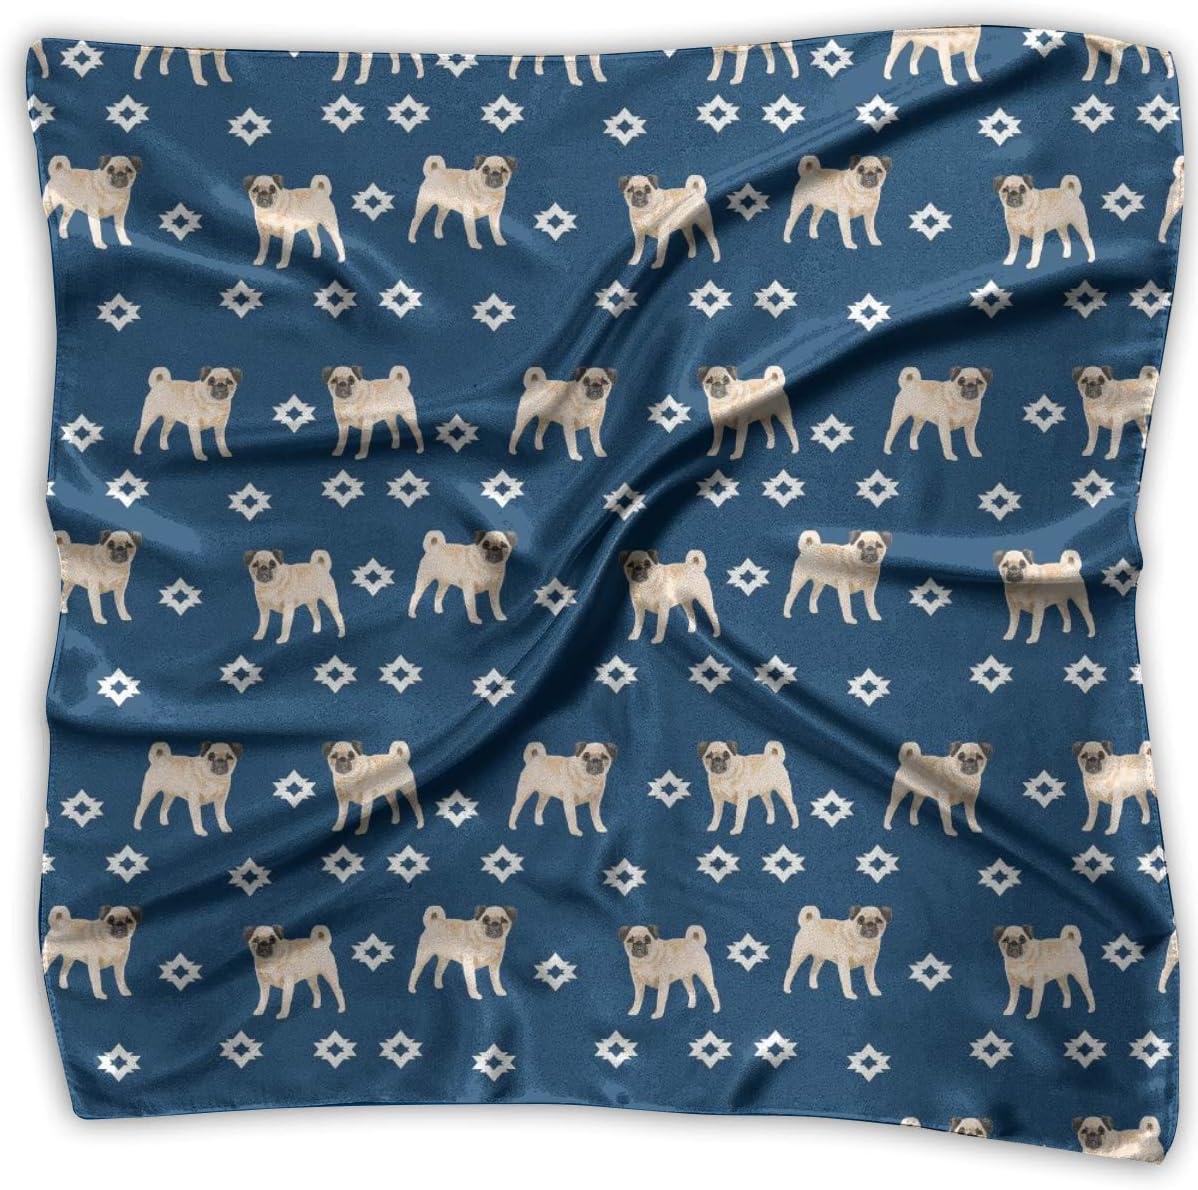 Pañuelo, popular amante de los perros Pugs Pañuelo de seda azul marino, elegantes diademas cuadradas para caballo de montaña Ridi